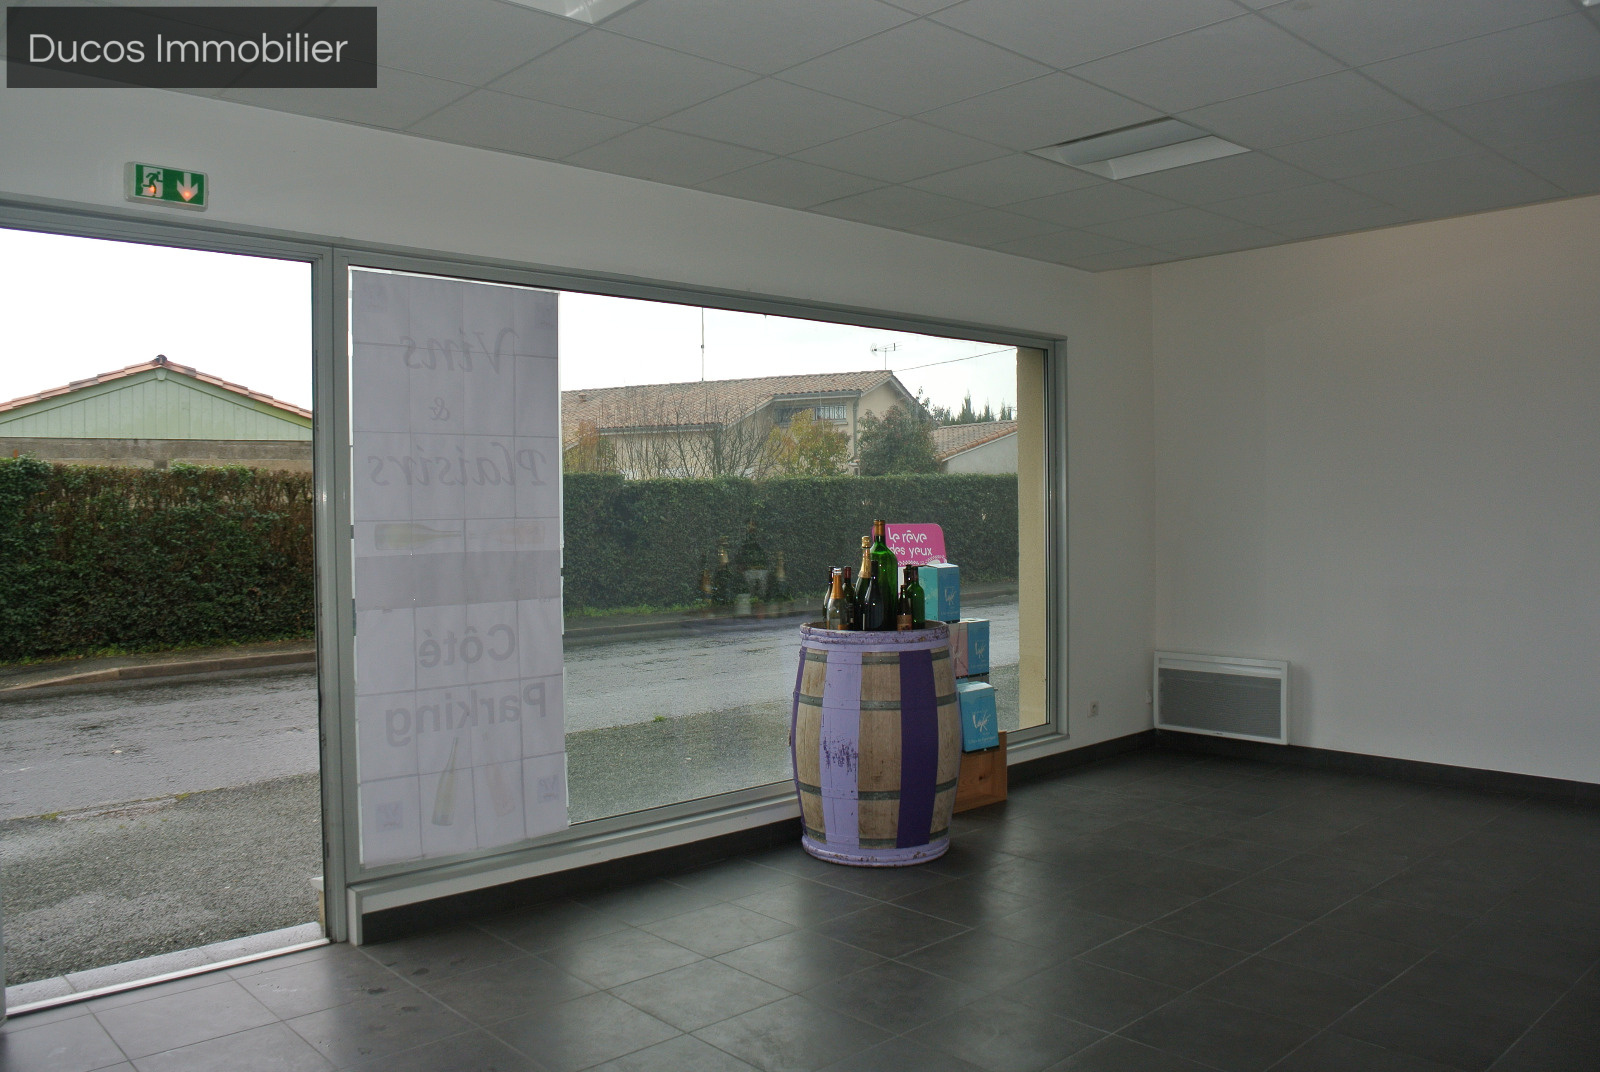 location bureau commerce marmande 47200 sur pro le. Black Bedroom Furniture Sets. Home Design Ideas